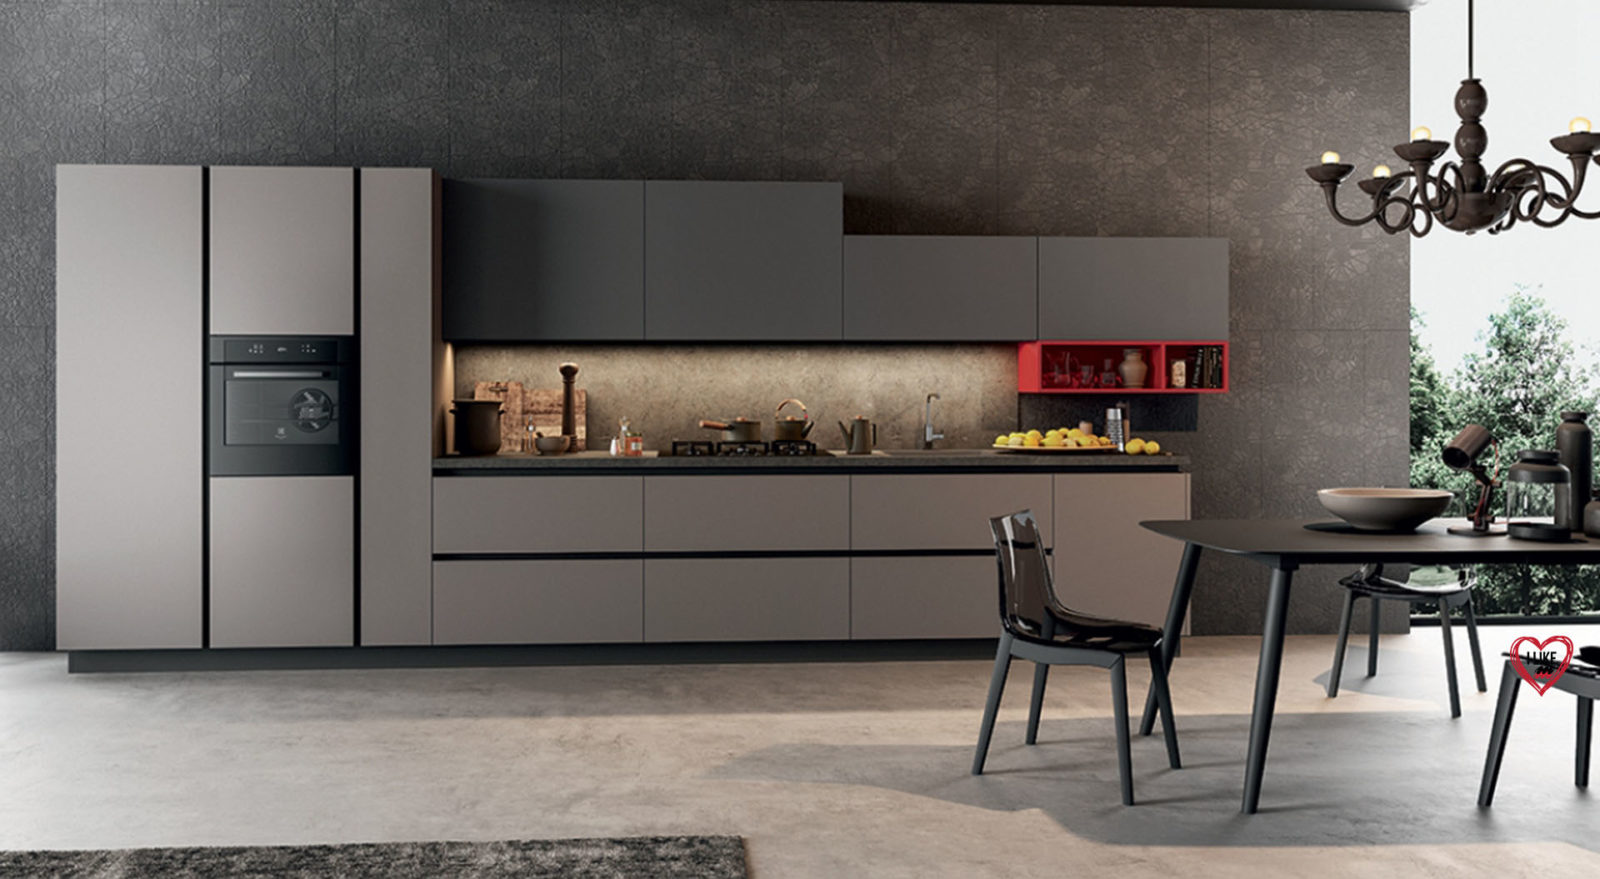 Cucine lineari moderne padova anche in offerta for Cucina 4 metri lineari prezzi